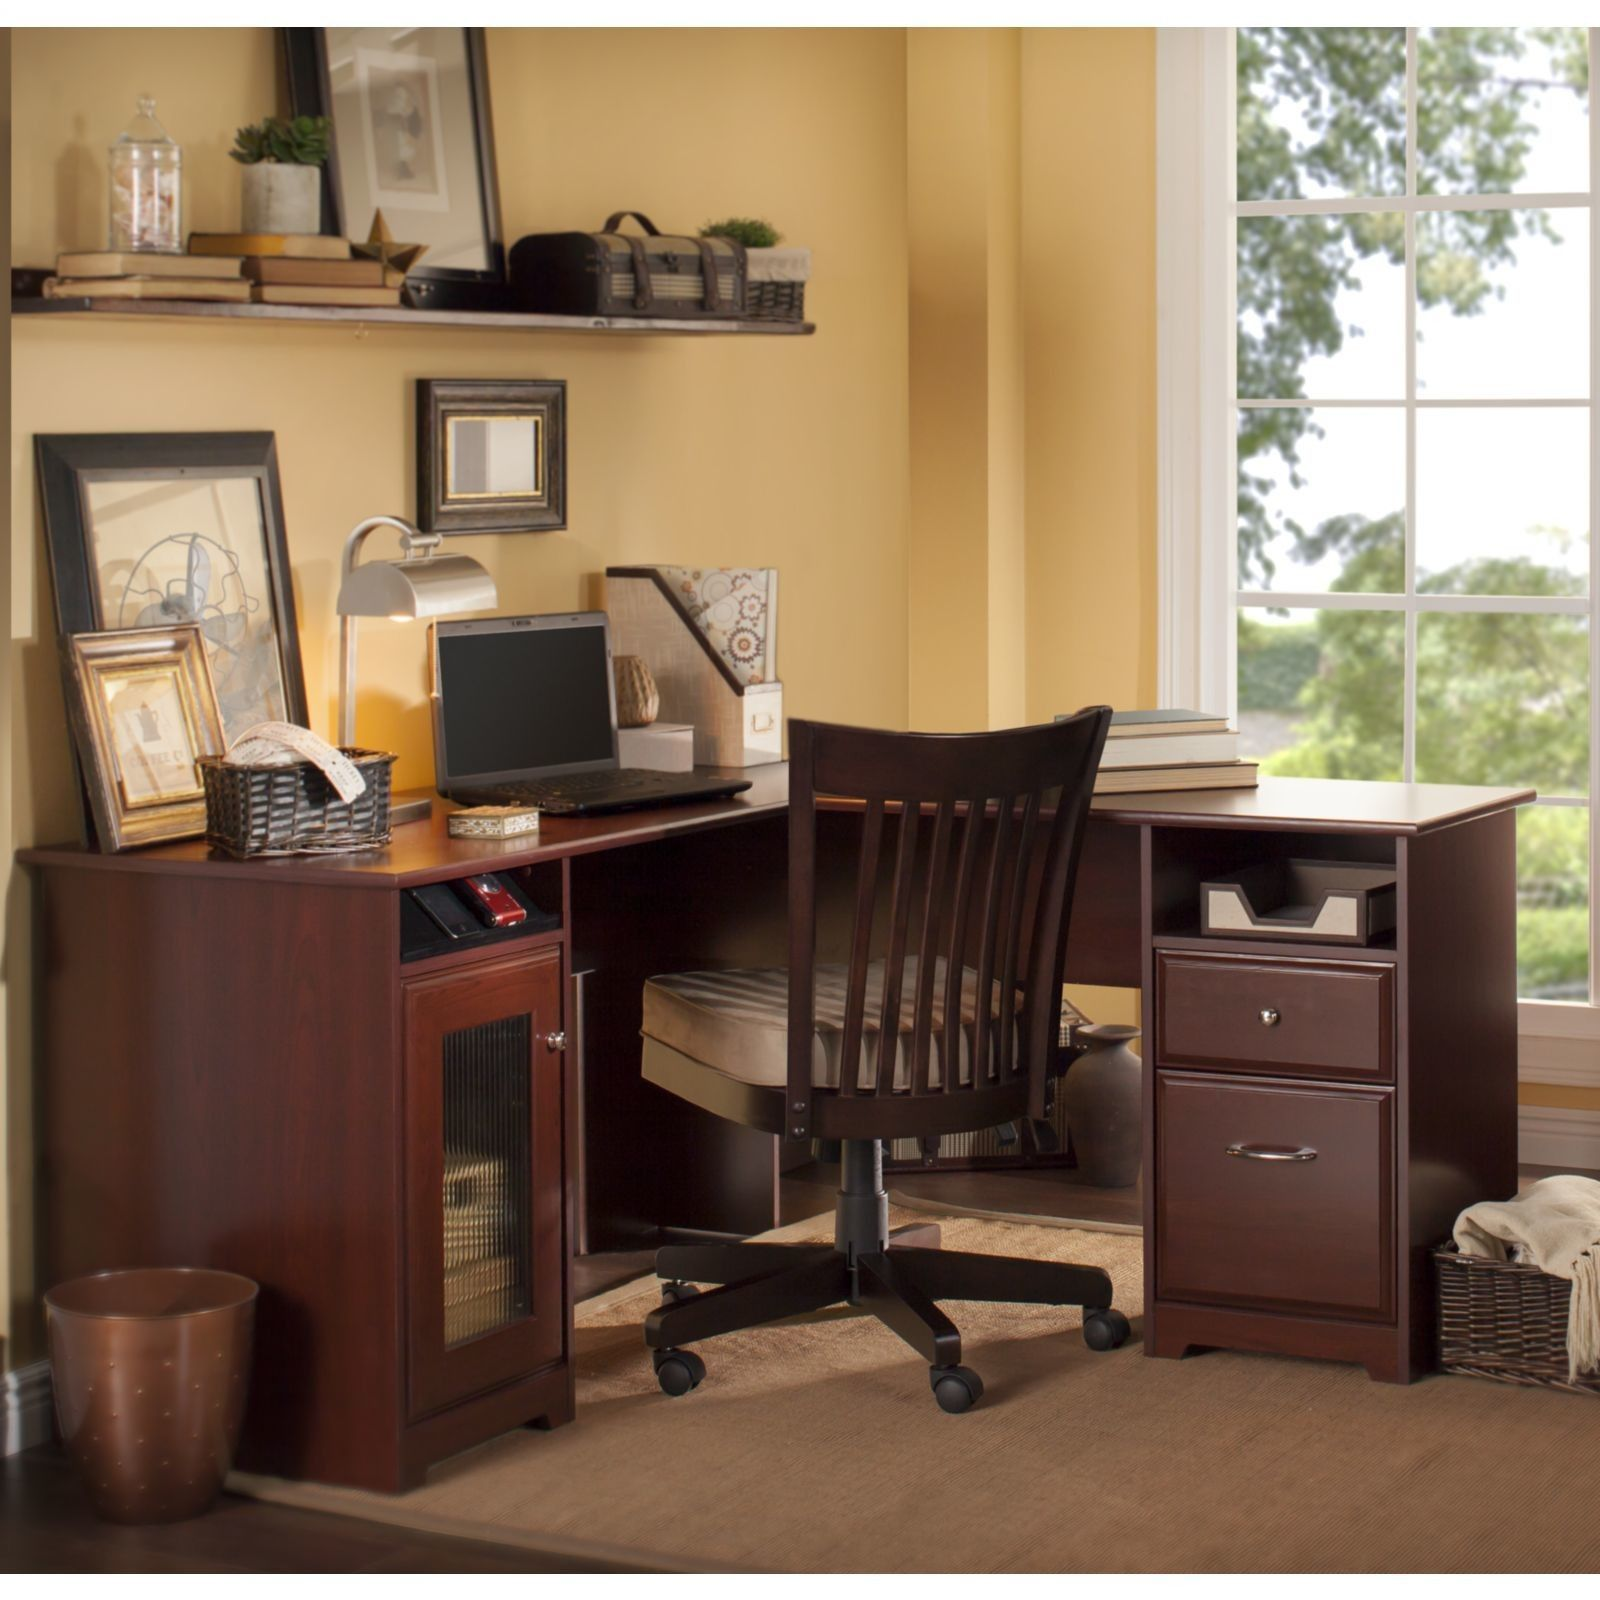 hutch desk most unit white splendiferous ingenuity l work pc storage corner with